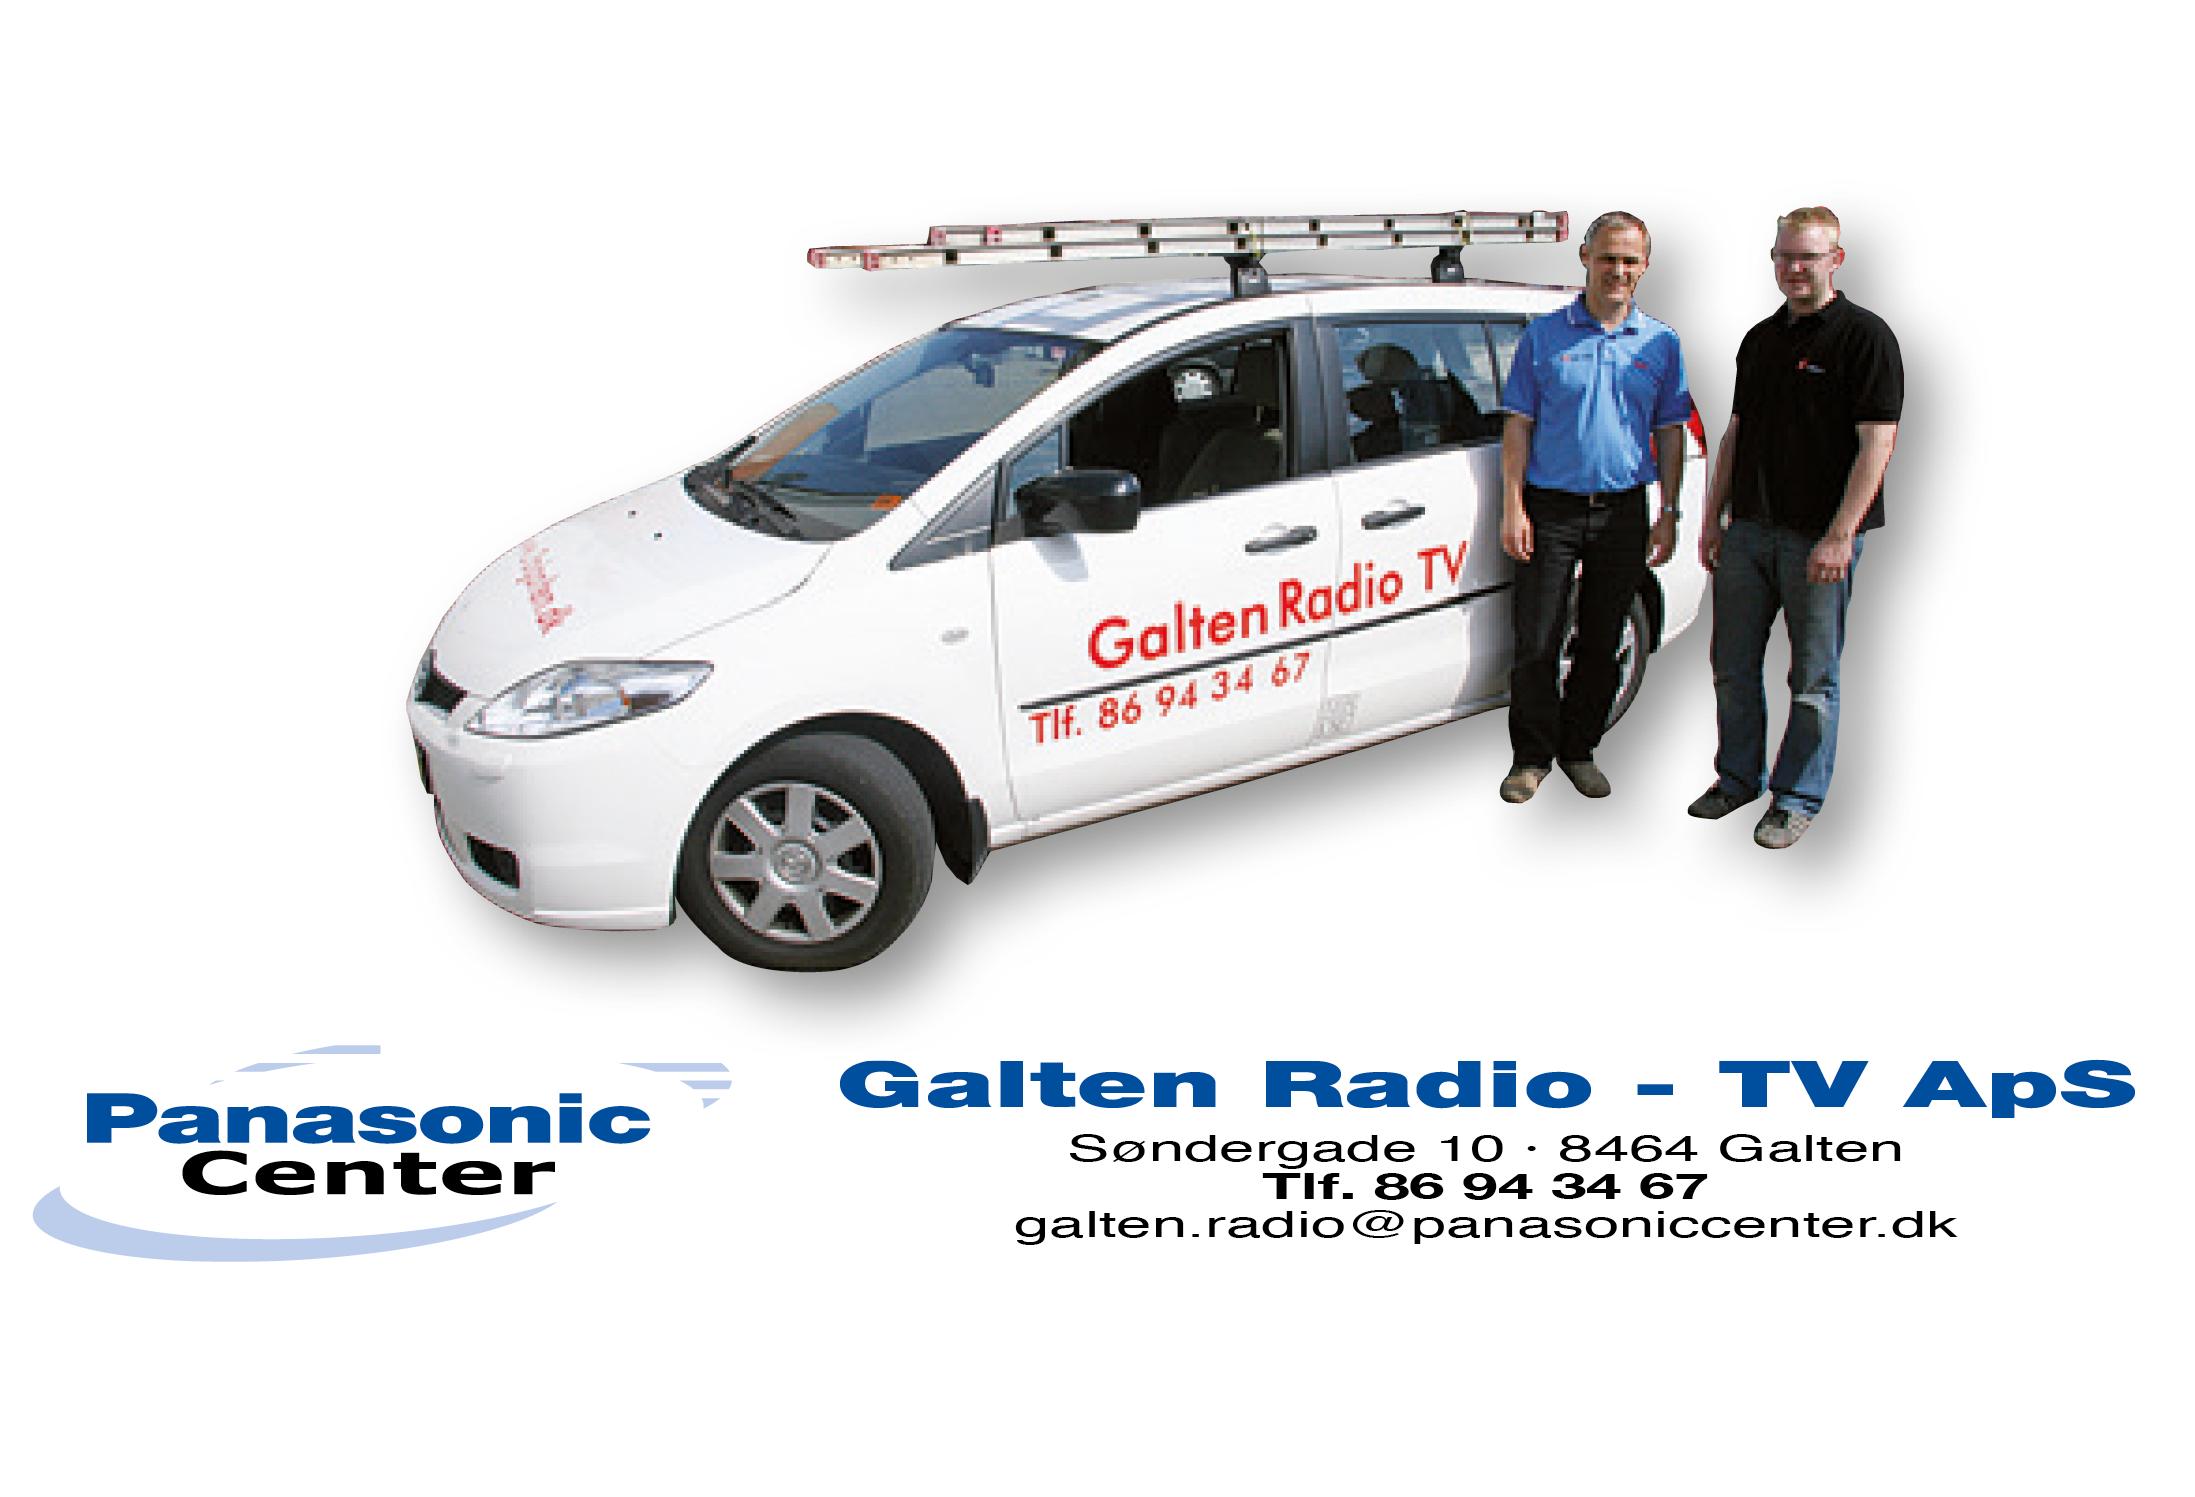 Galten Radio-TV annonce WEB